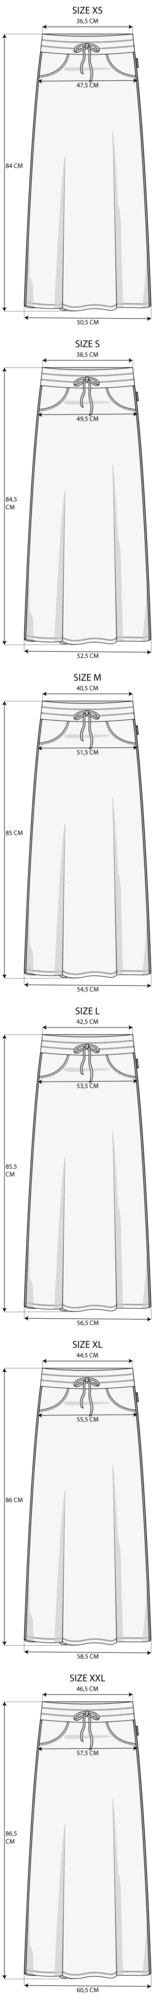 Maattabel Skirt